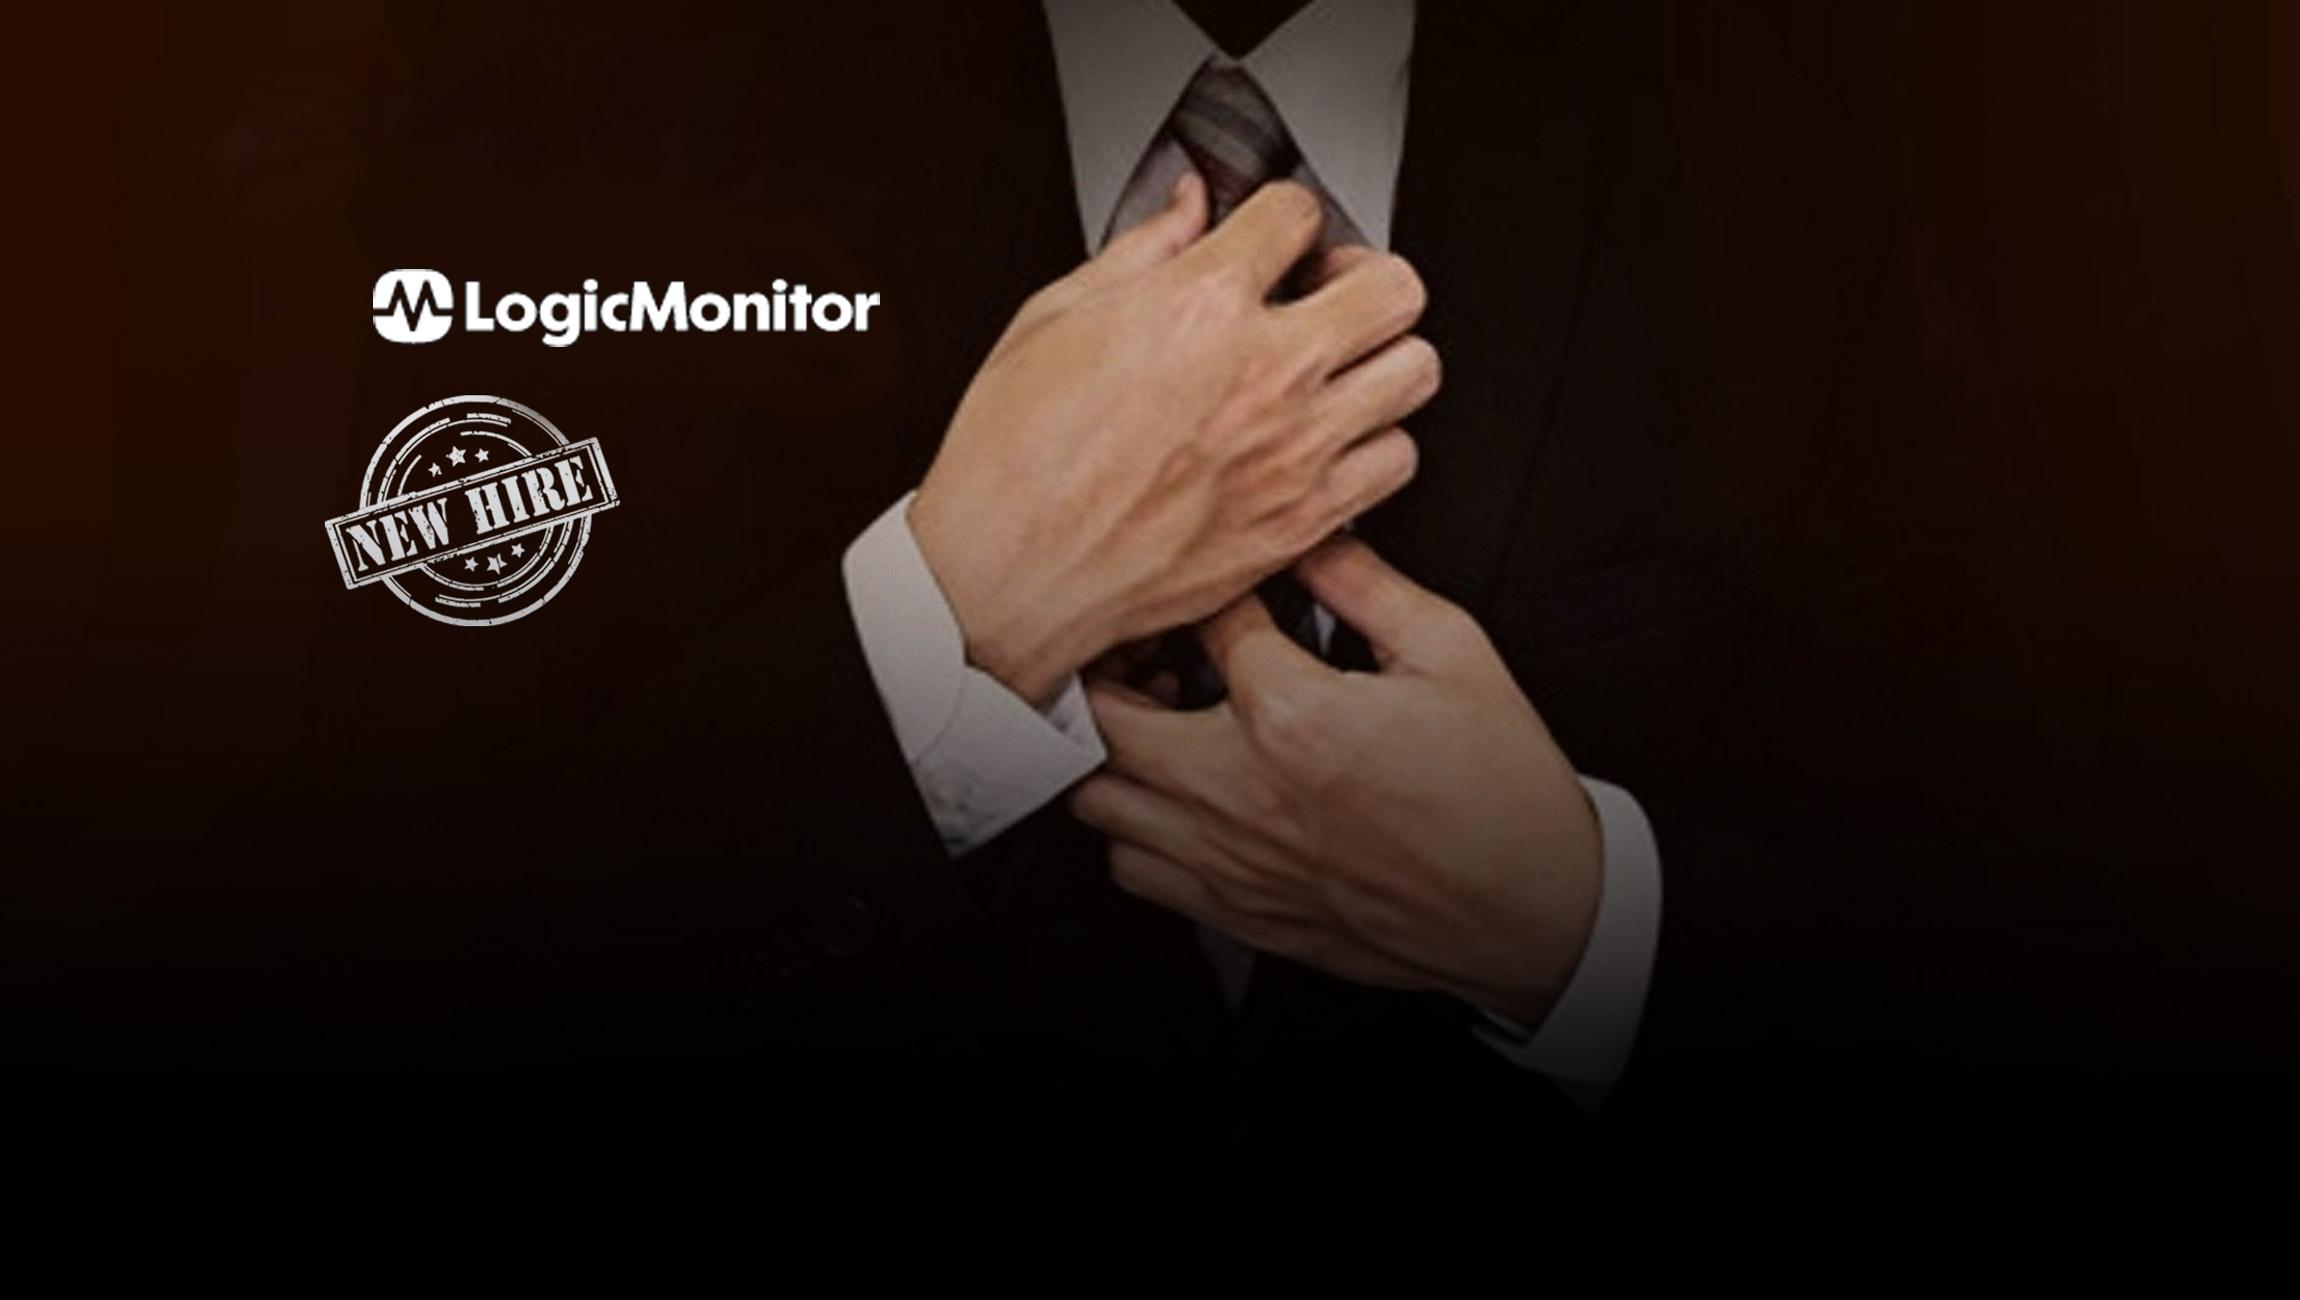 LogicMonitor Appoints Former Slack Executive Christina Kosmowski as President